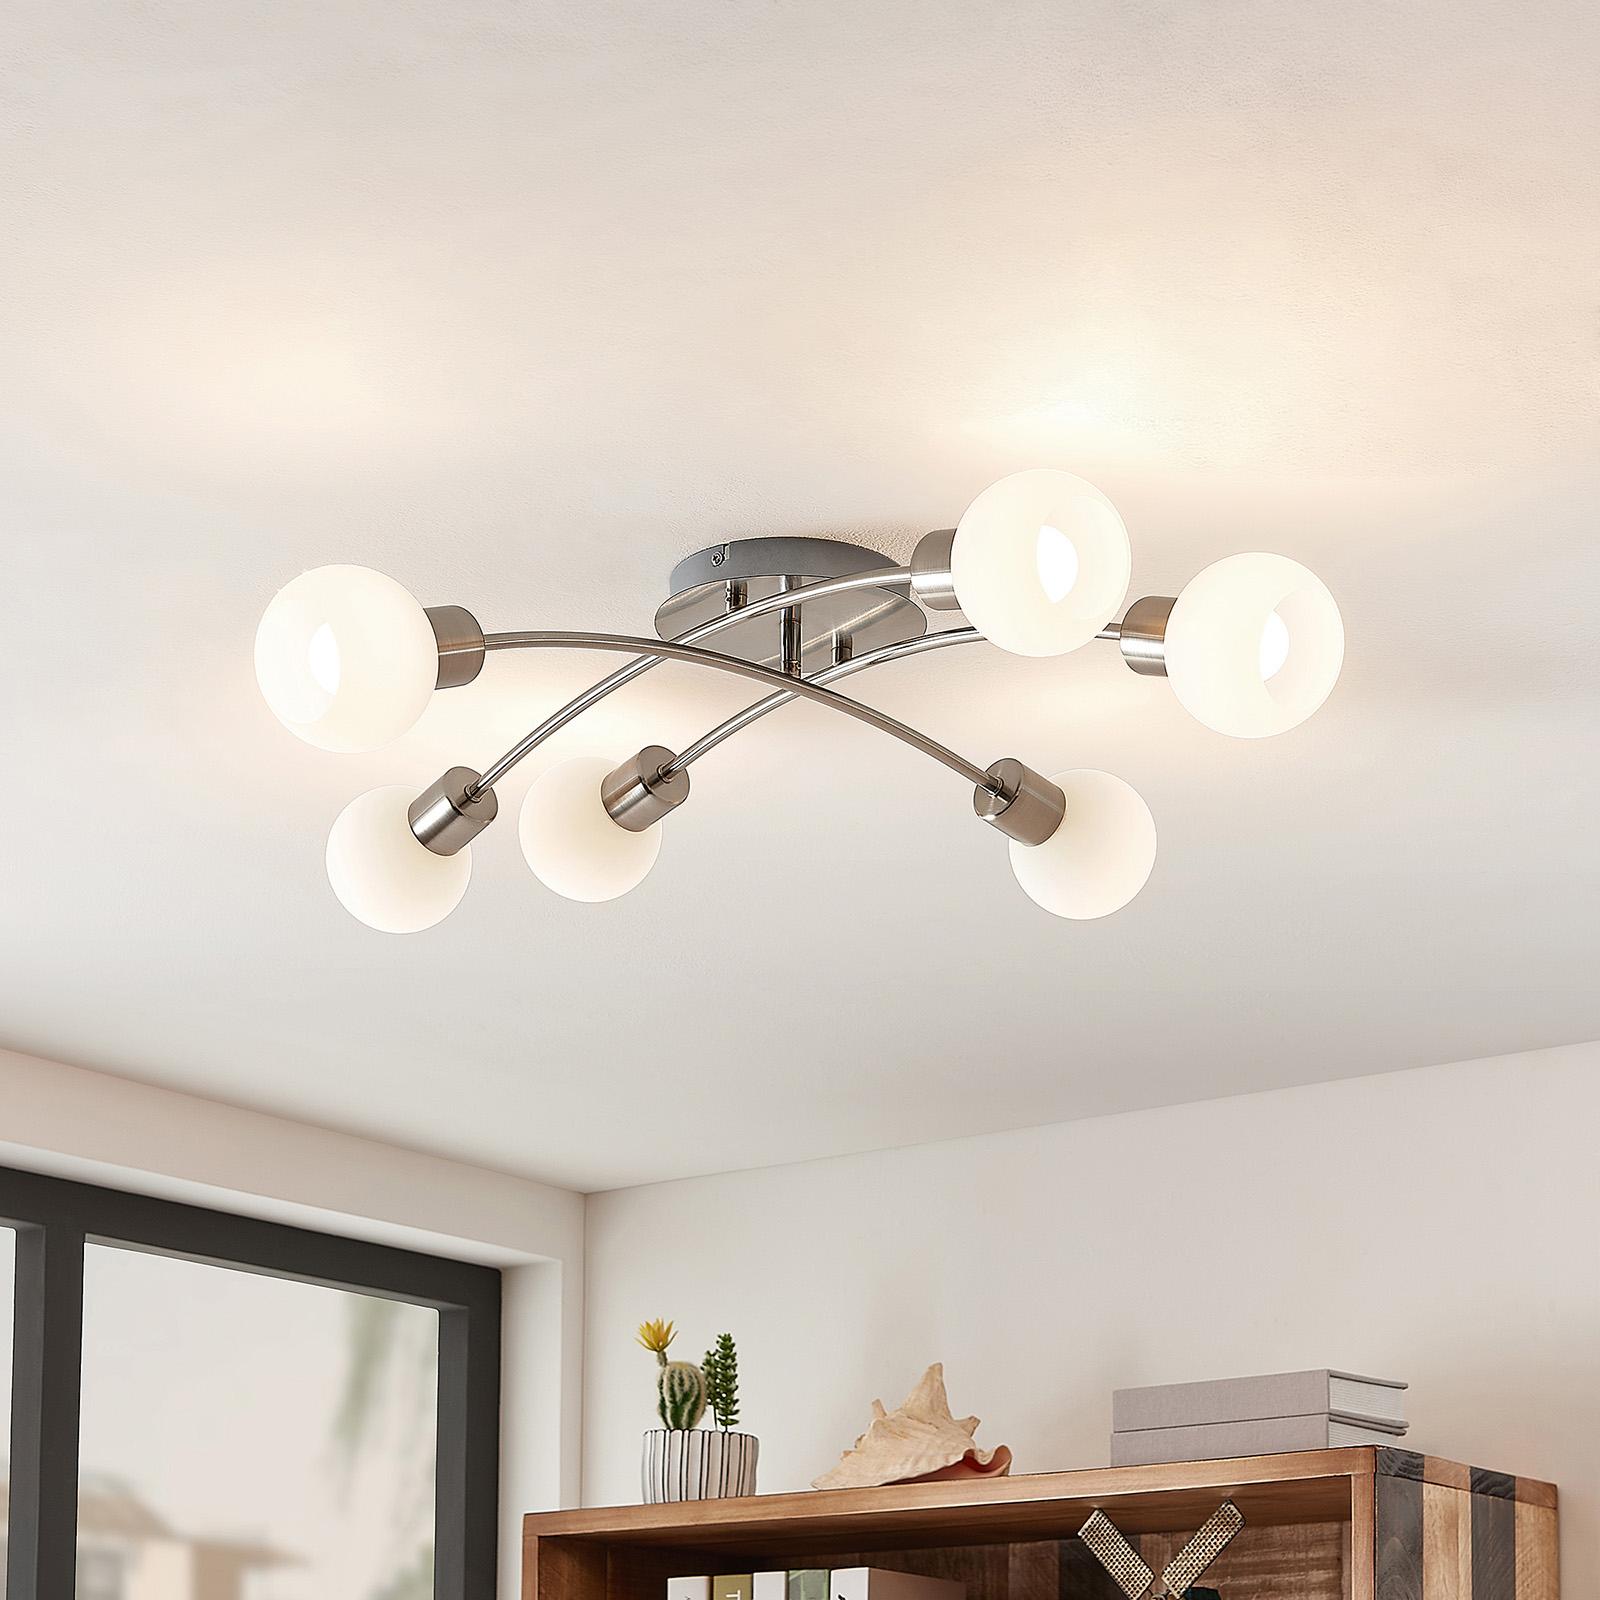 Lindby Agmar LED-taklampa, nickel, 6 lampor